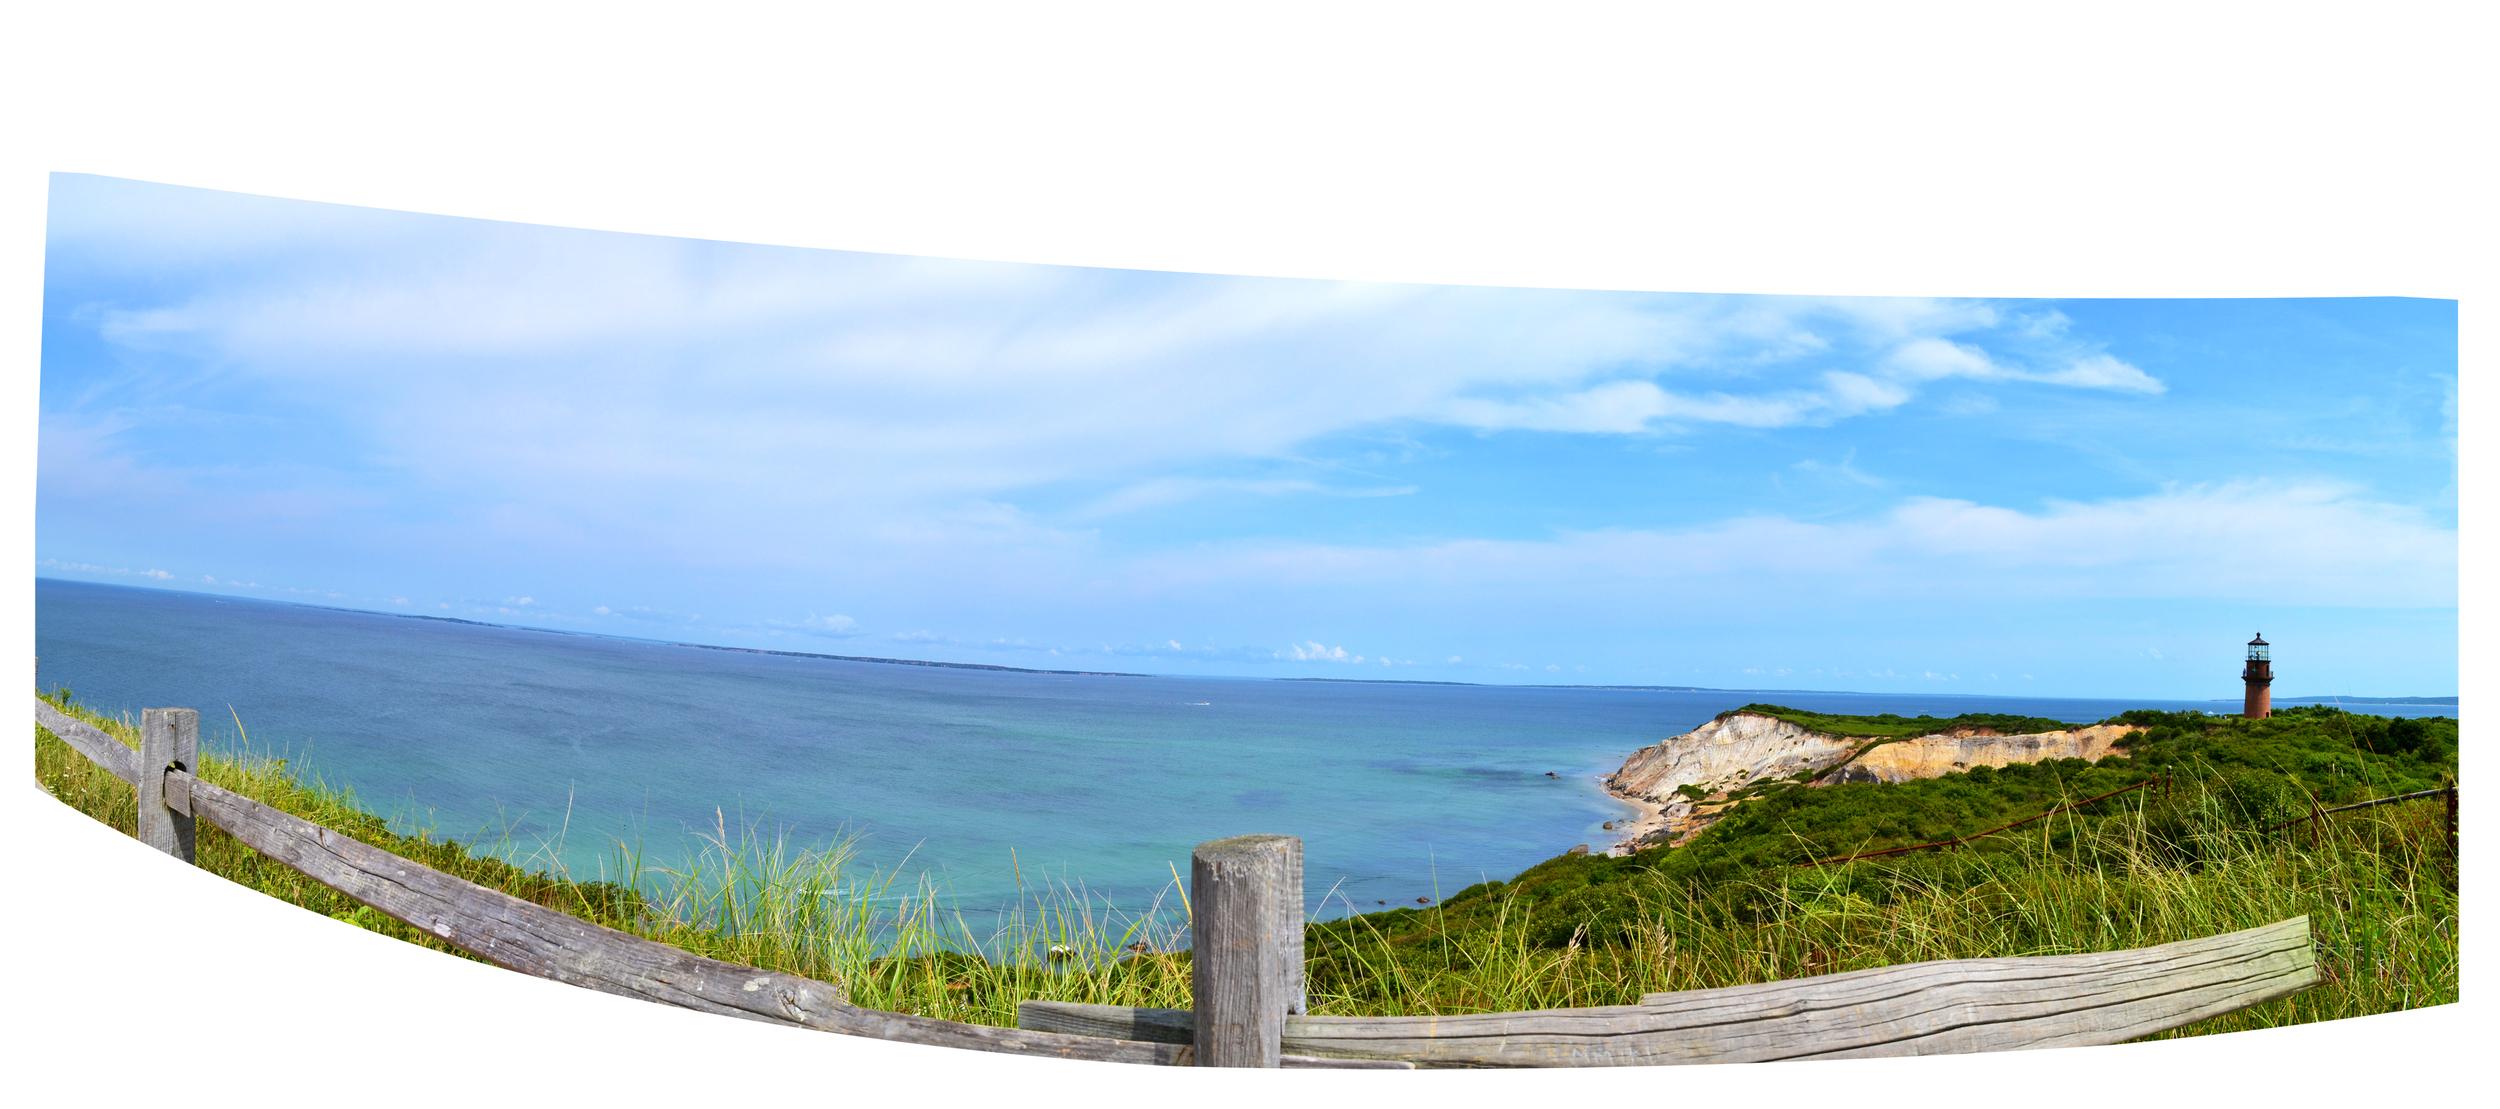 Gay Head Lighthouse, Aquinnah Beach, Martha's Vineyard, MA, August 2014